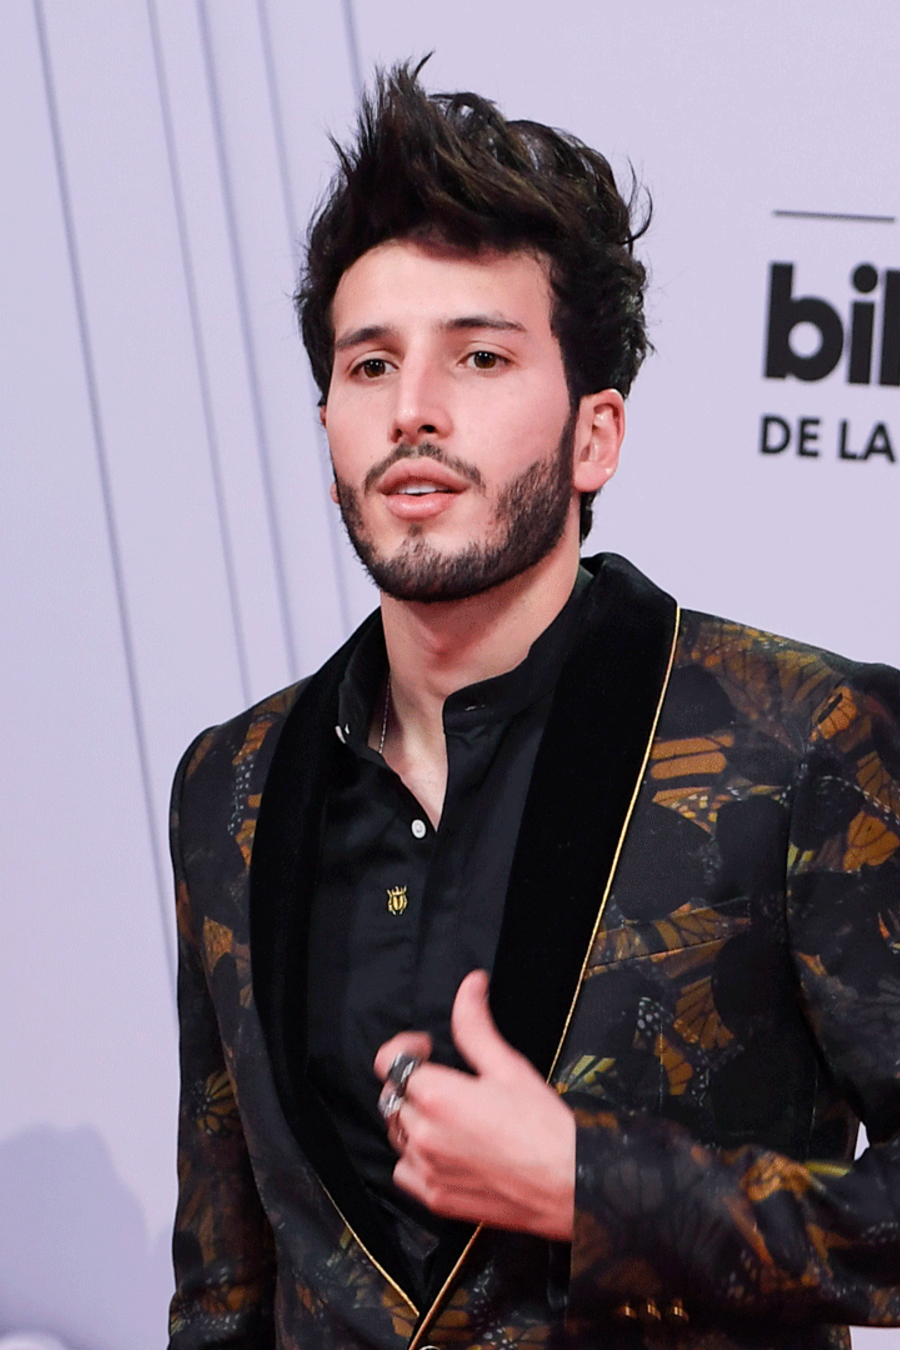 Sebastian Yatra Premios Billboard